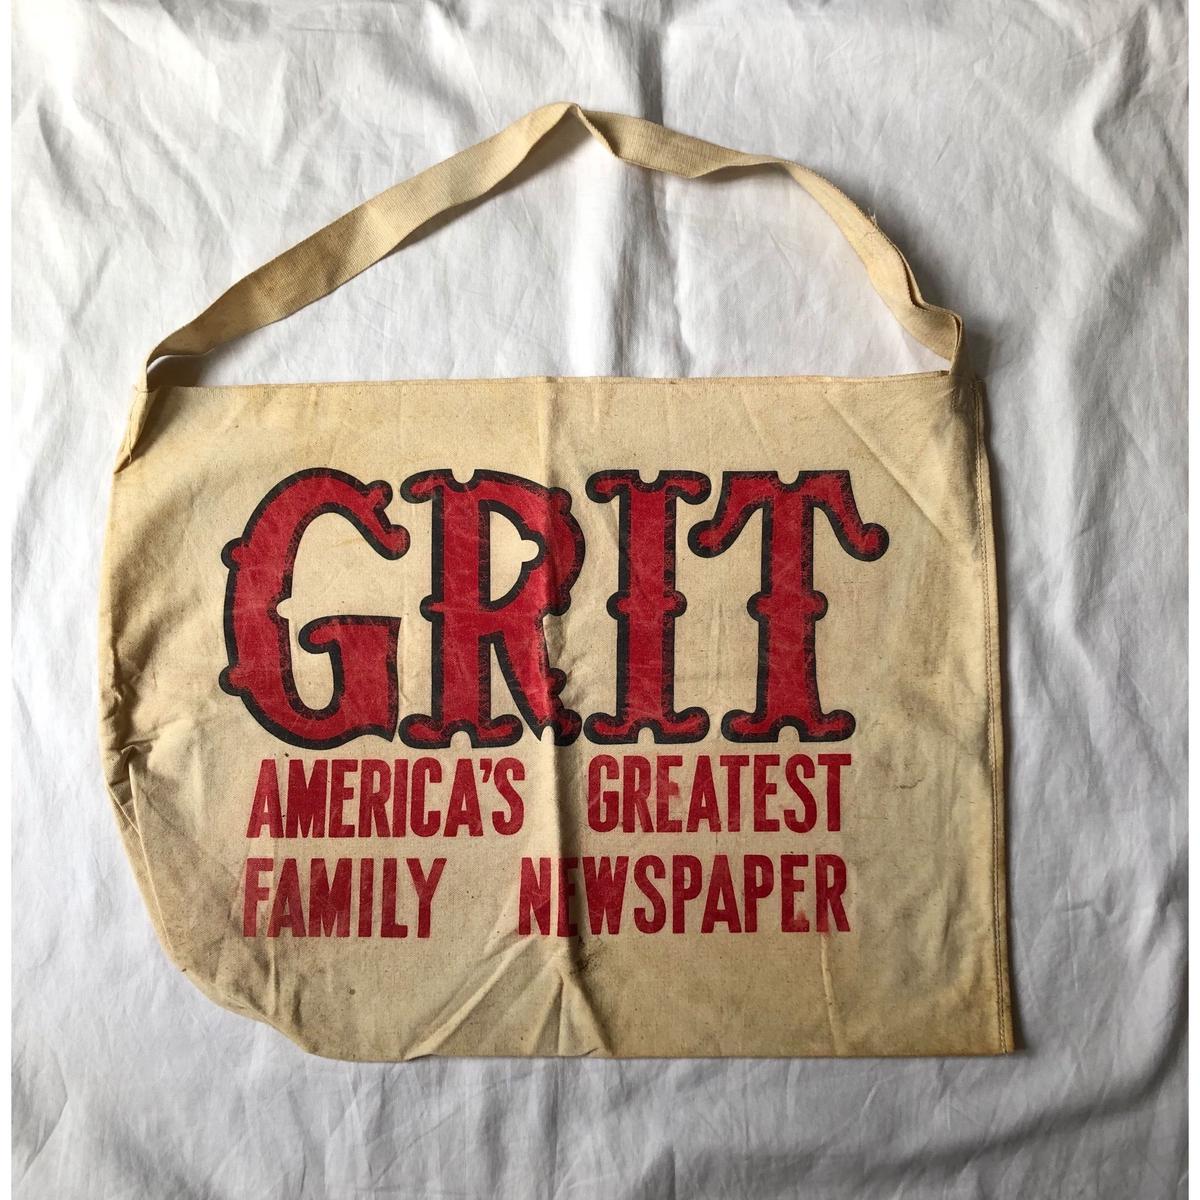 Crochet Bag, Granny Square Bag, Crochet Purse, Crochet tote Bag, Retro Style, Gift for